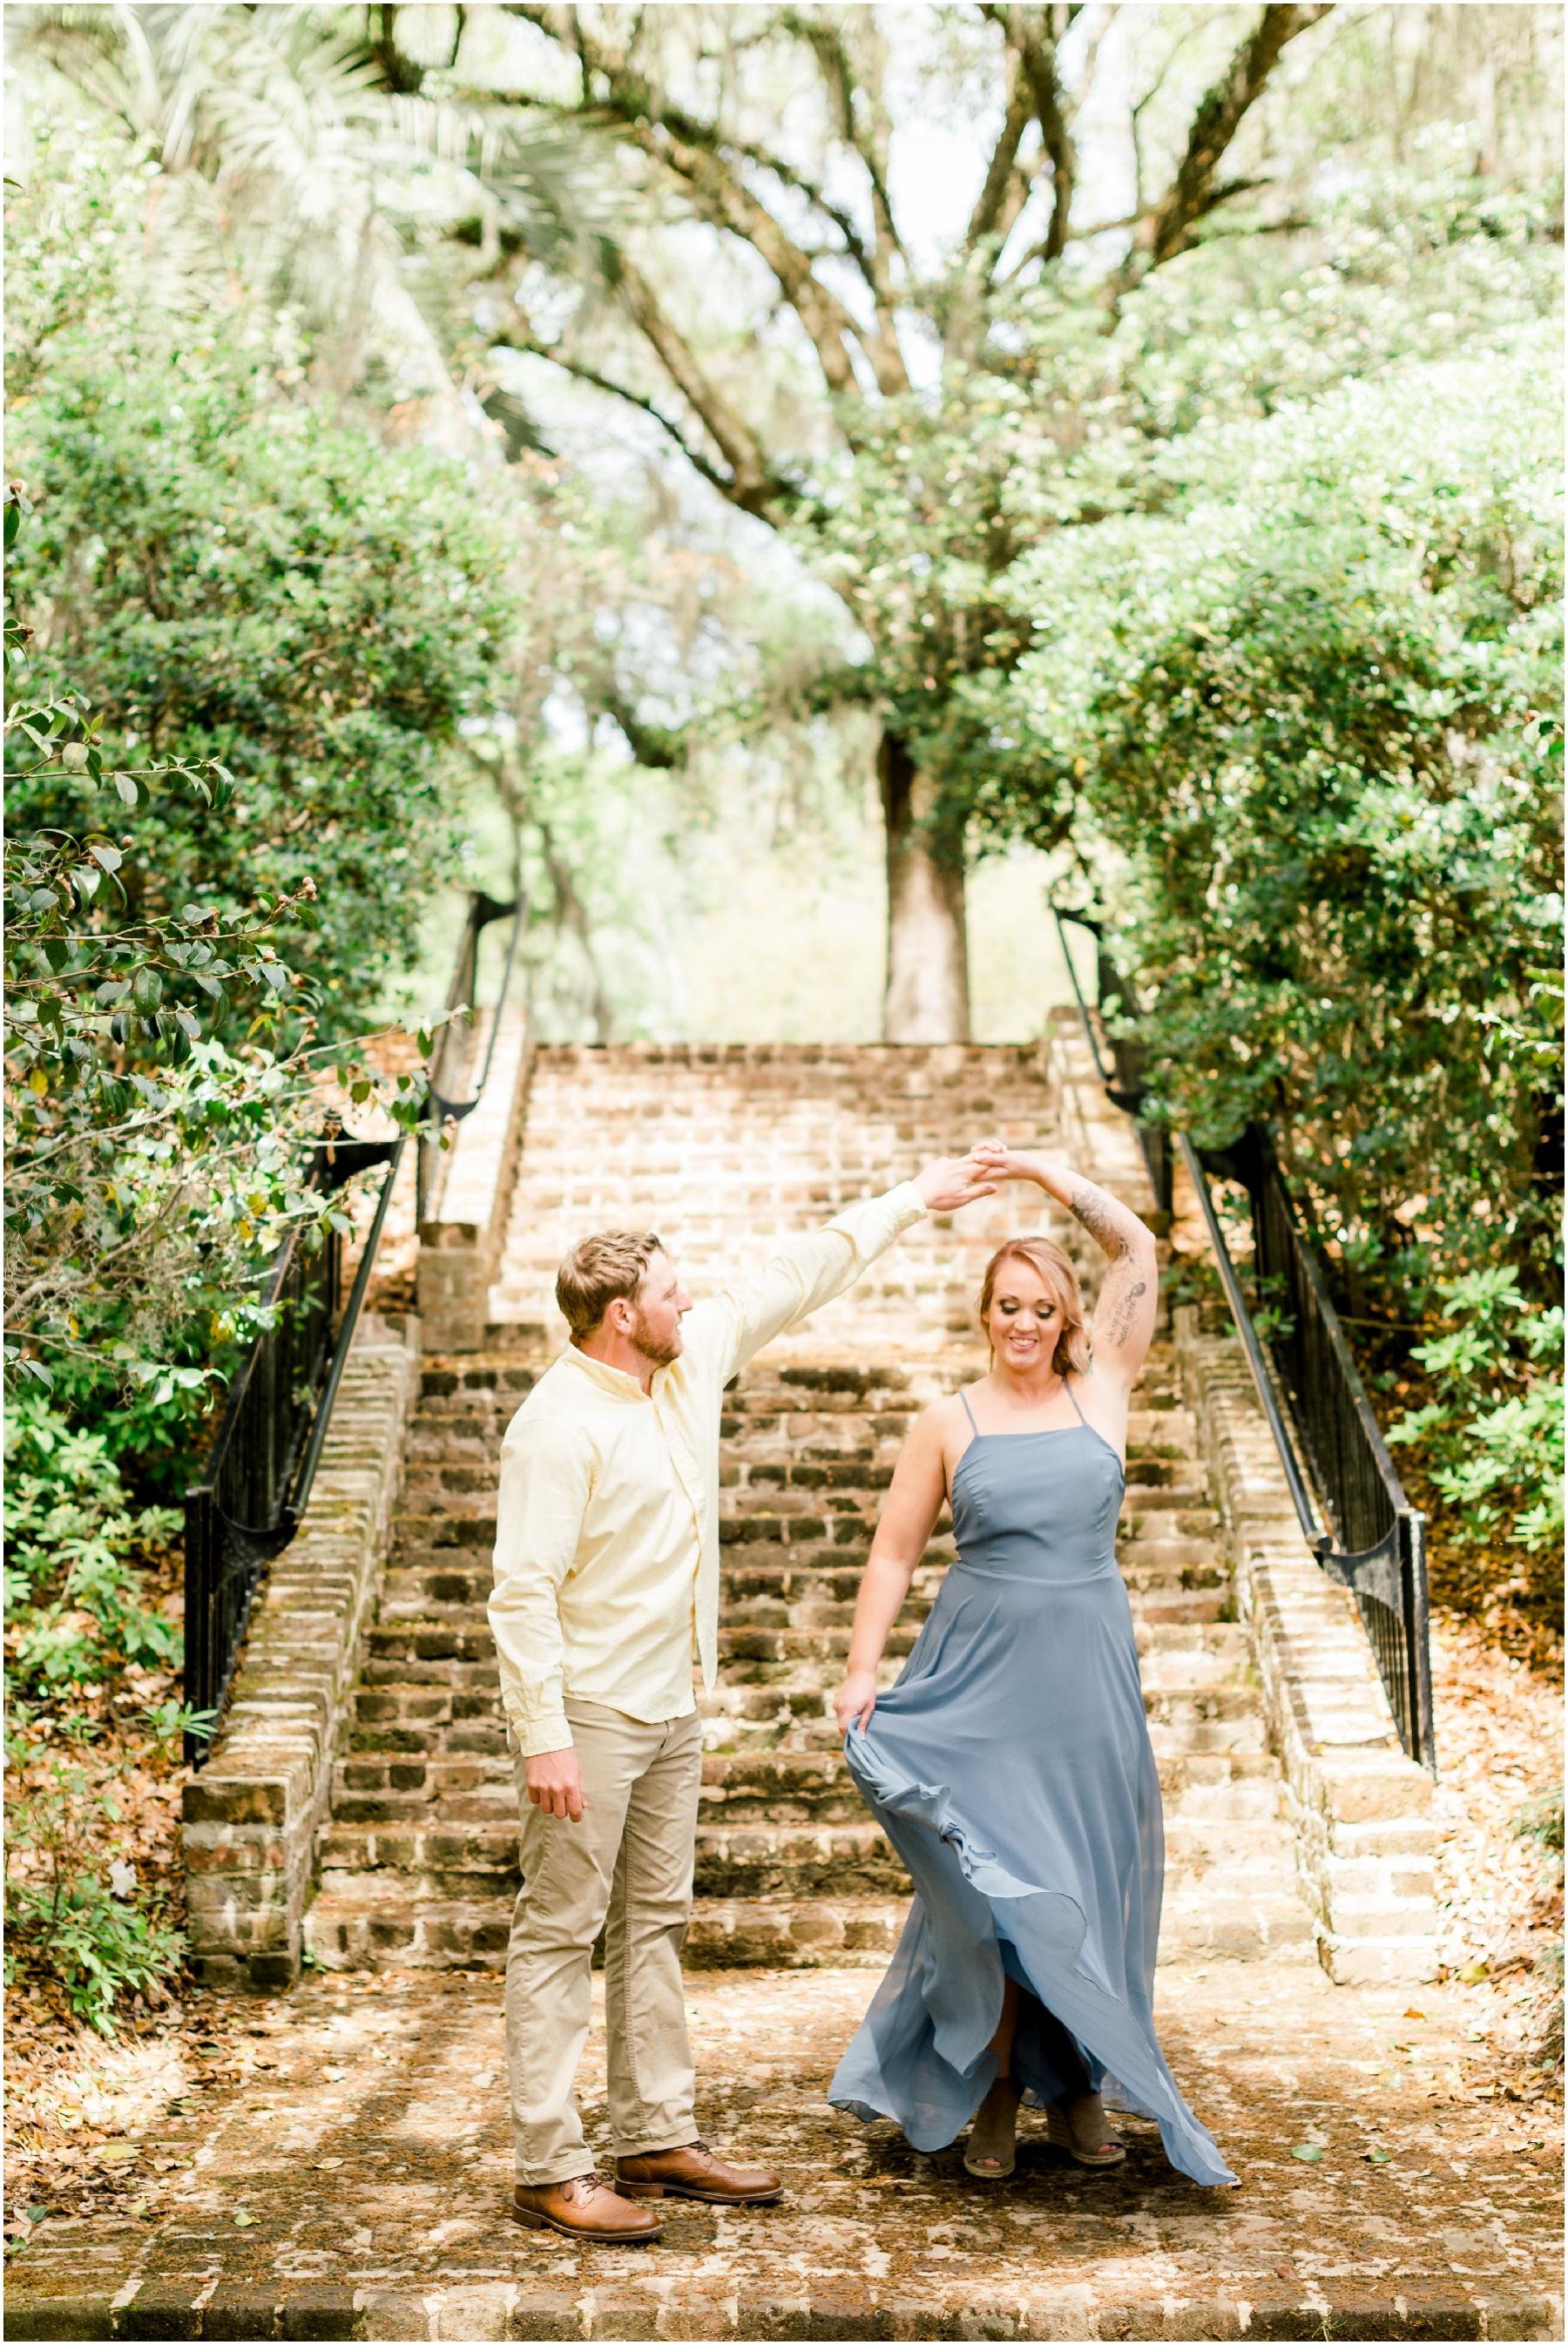 Mepkin-Abbey-Moncks-Corner-South-Carolina-Engagement-Session-Photos_0015.jpg